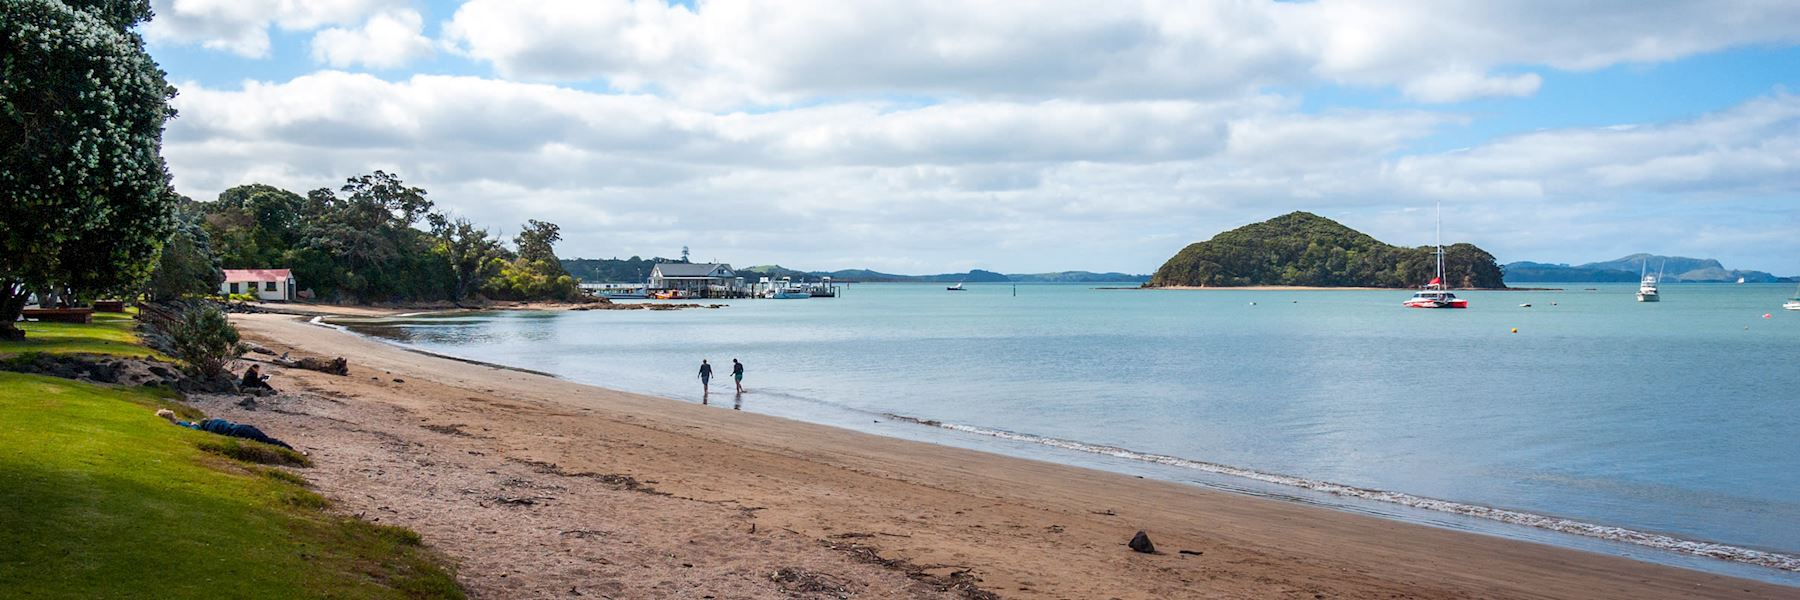 Hotels Paihia New Zealand